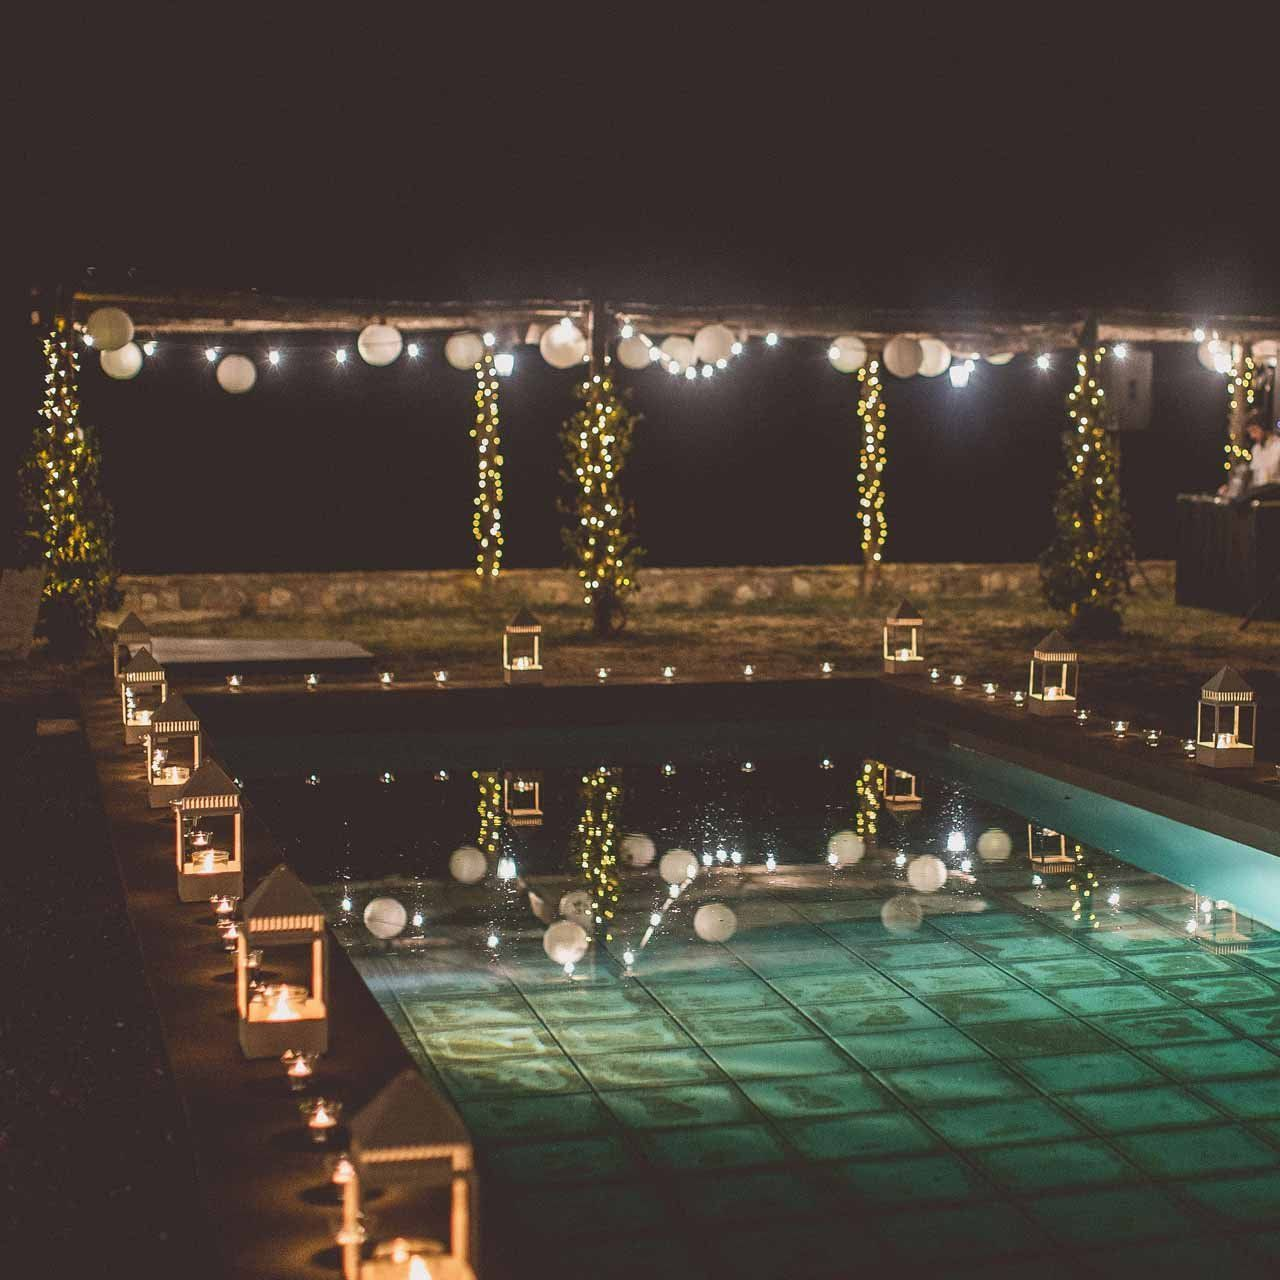 Swimming Pool Wedding Decorations Lanterns Candles Tea Lights